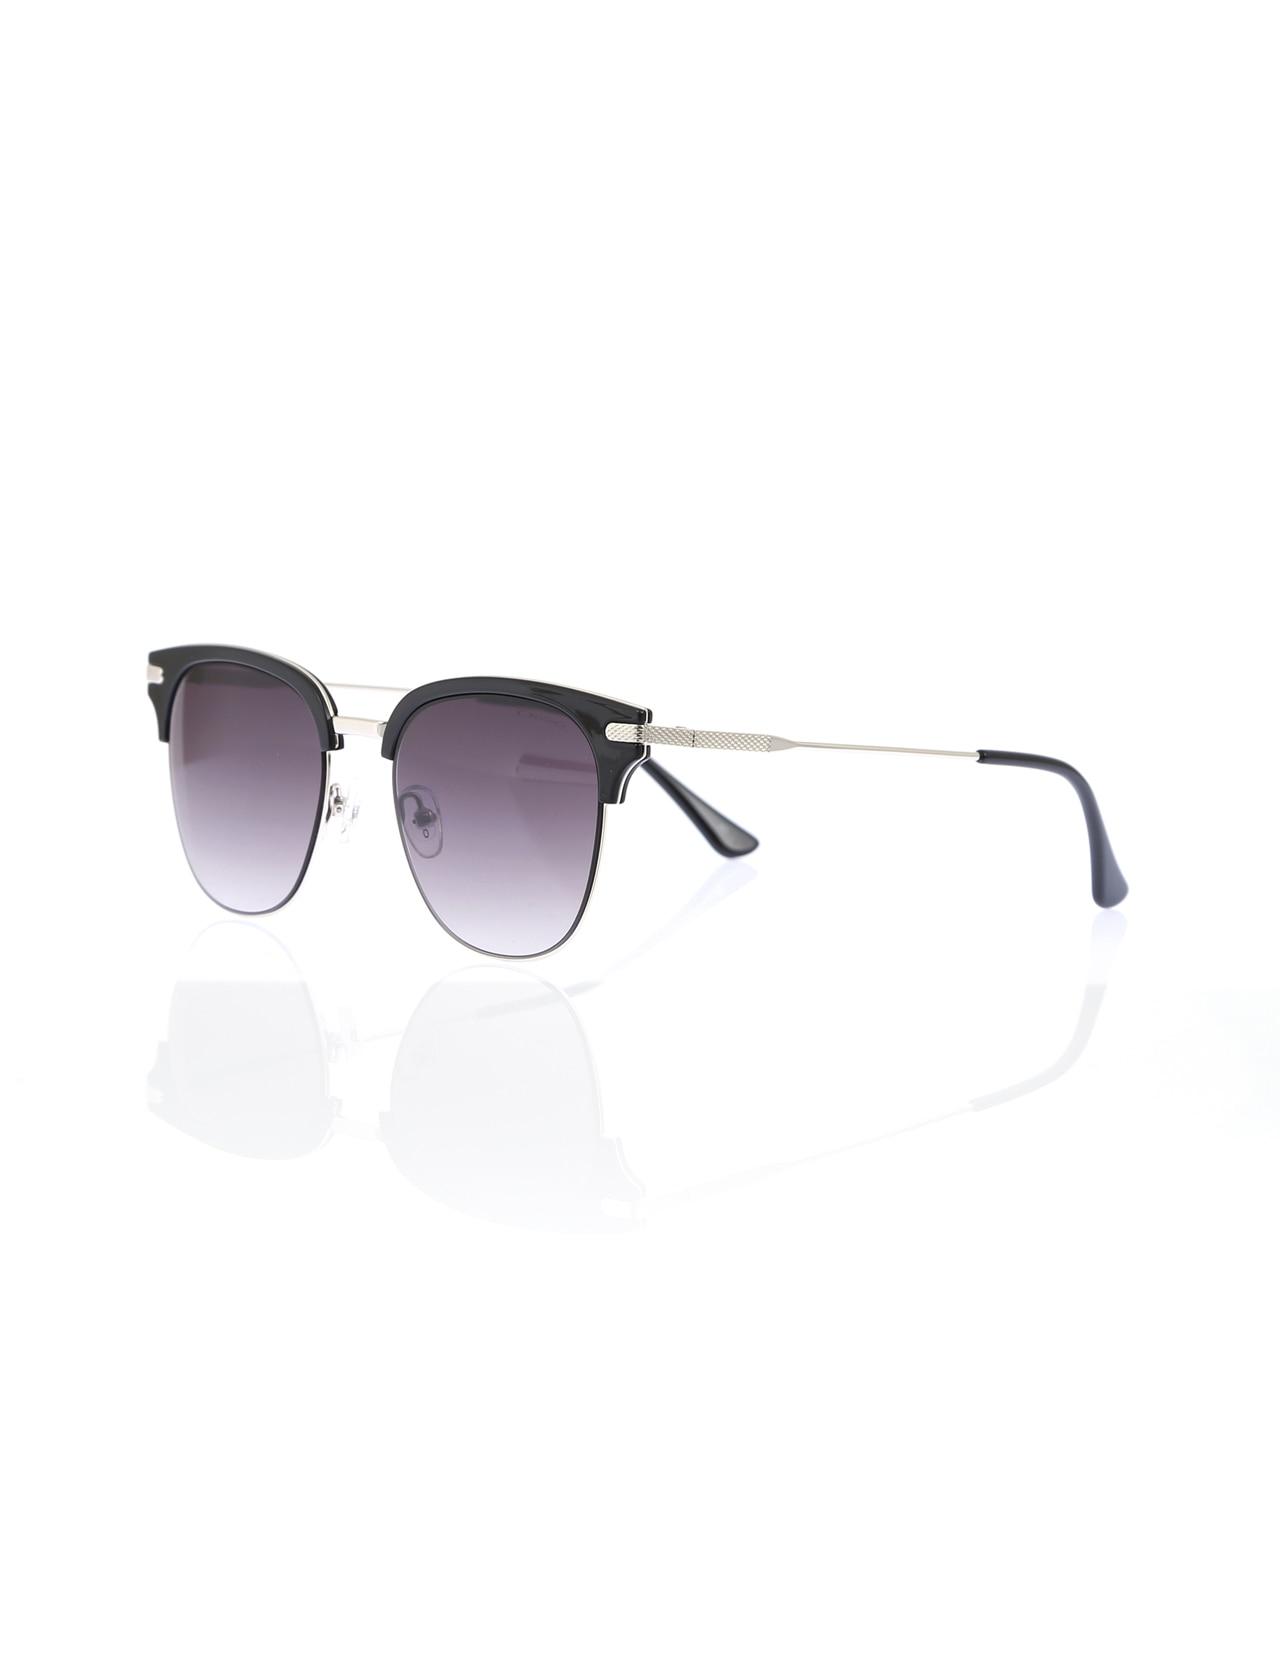 Unisex sunglasses os 2821 03 clubmaster silver organic square square 51-19-141 osse